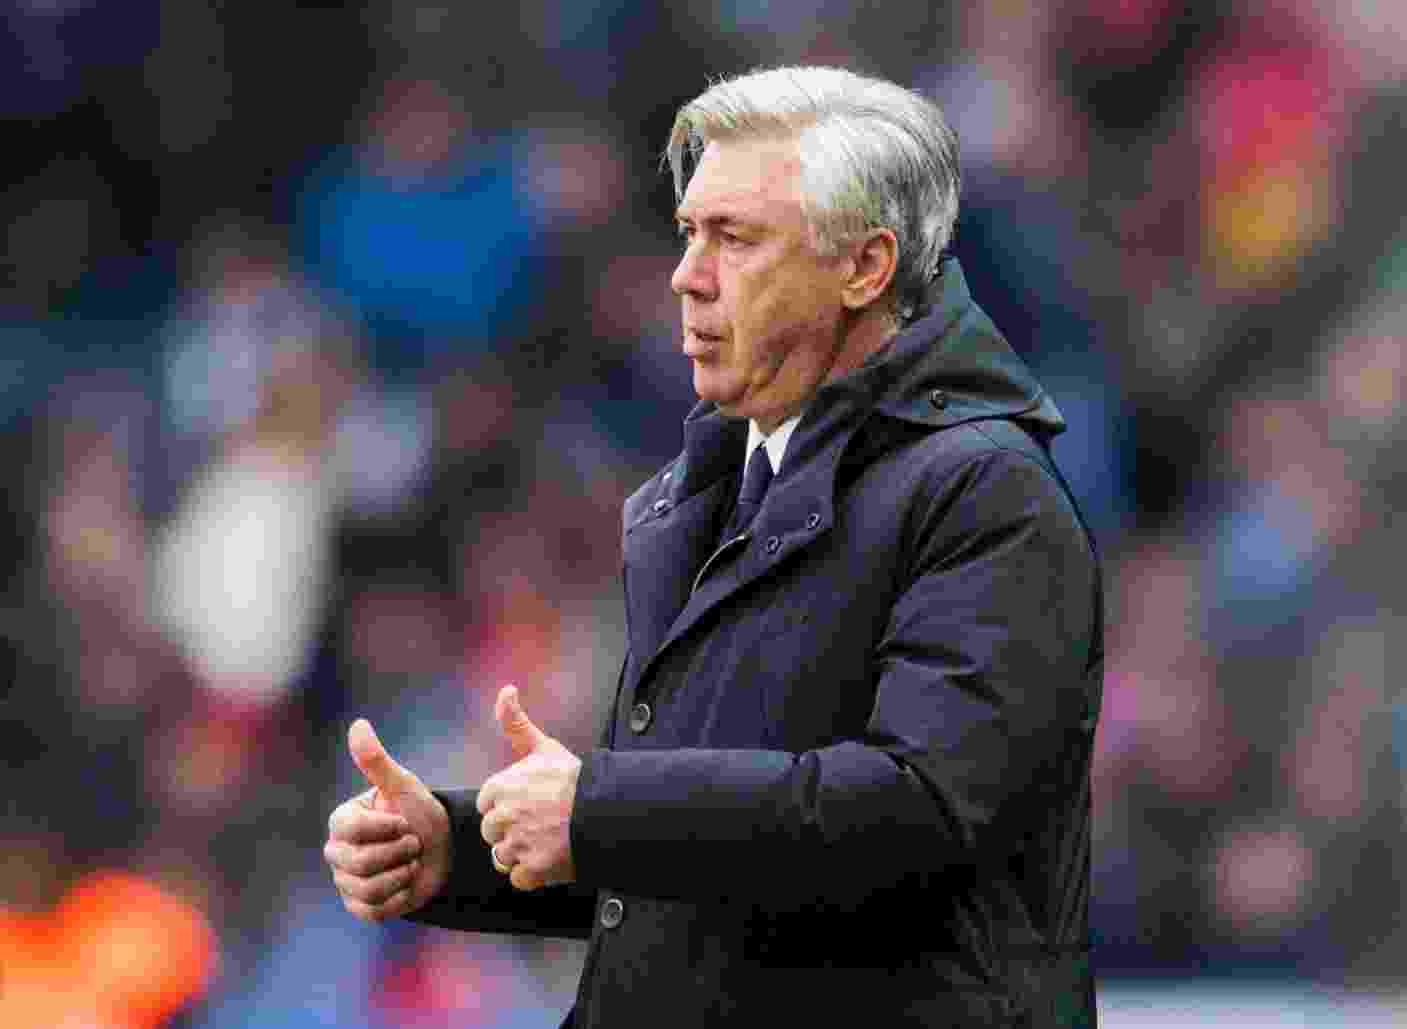 Carlo Ancelotti, técnico do Bayern, dirige o Bayern em partida contra o Hamburgo - ROBERT MICHAEL/AFP